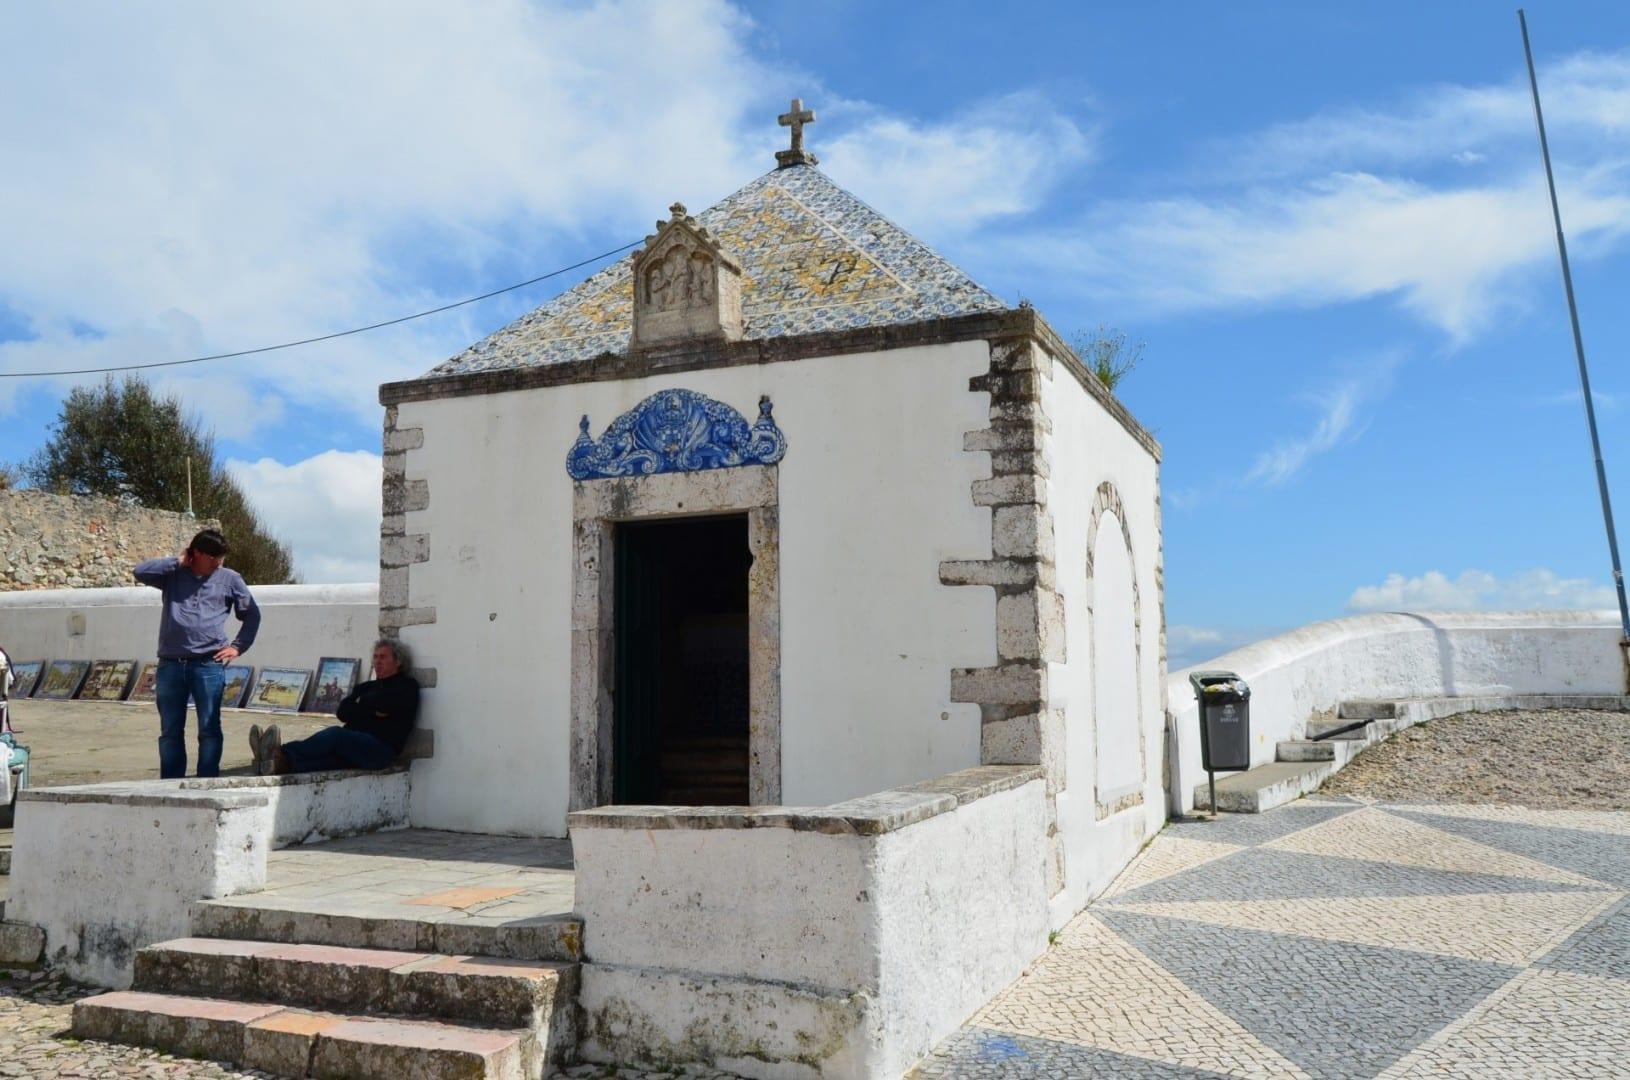 La Capilla de la Memoria de Nazaré Nazaré Portugal